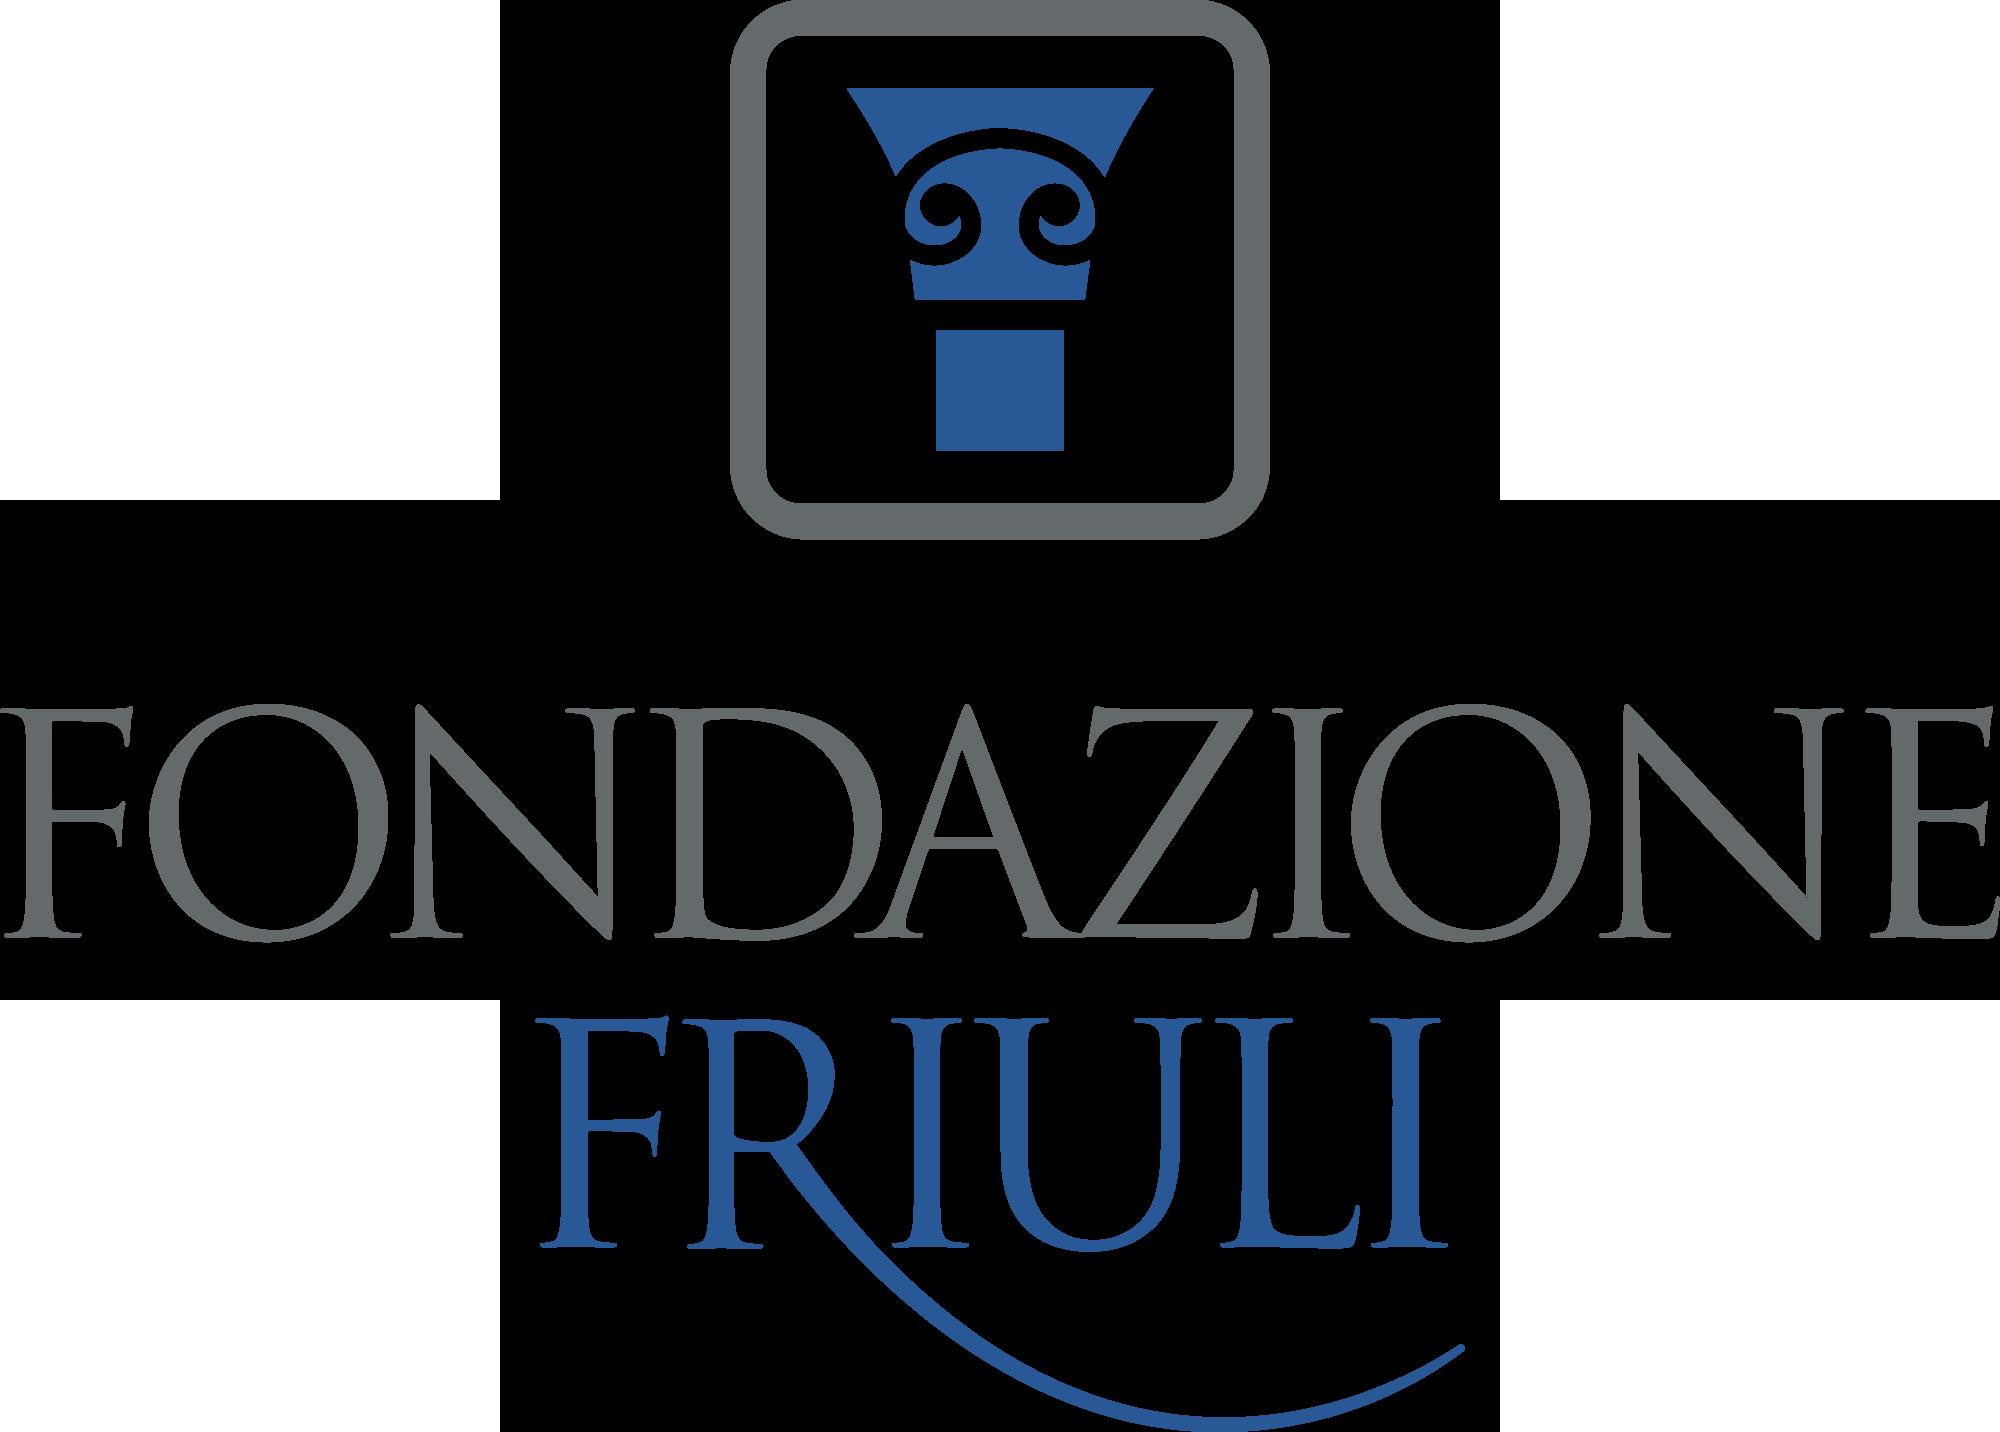 Fondazione Friuli